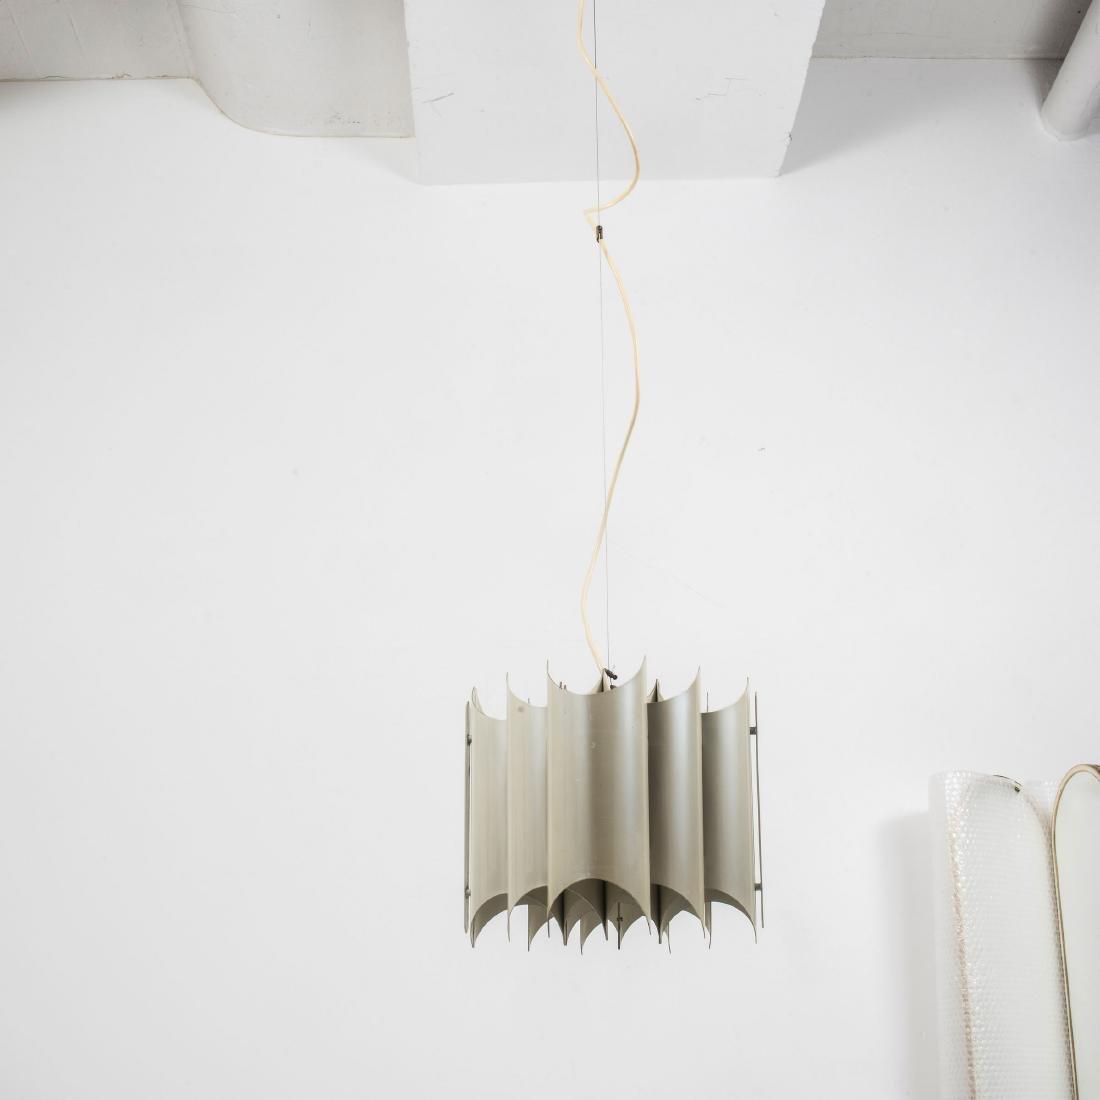 Ceiling light, c. 1965 - 5